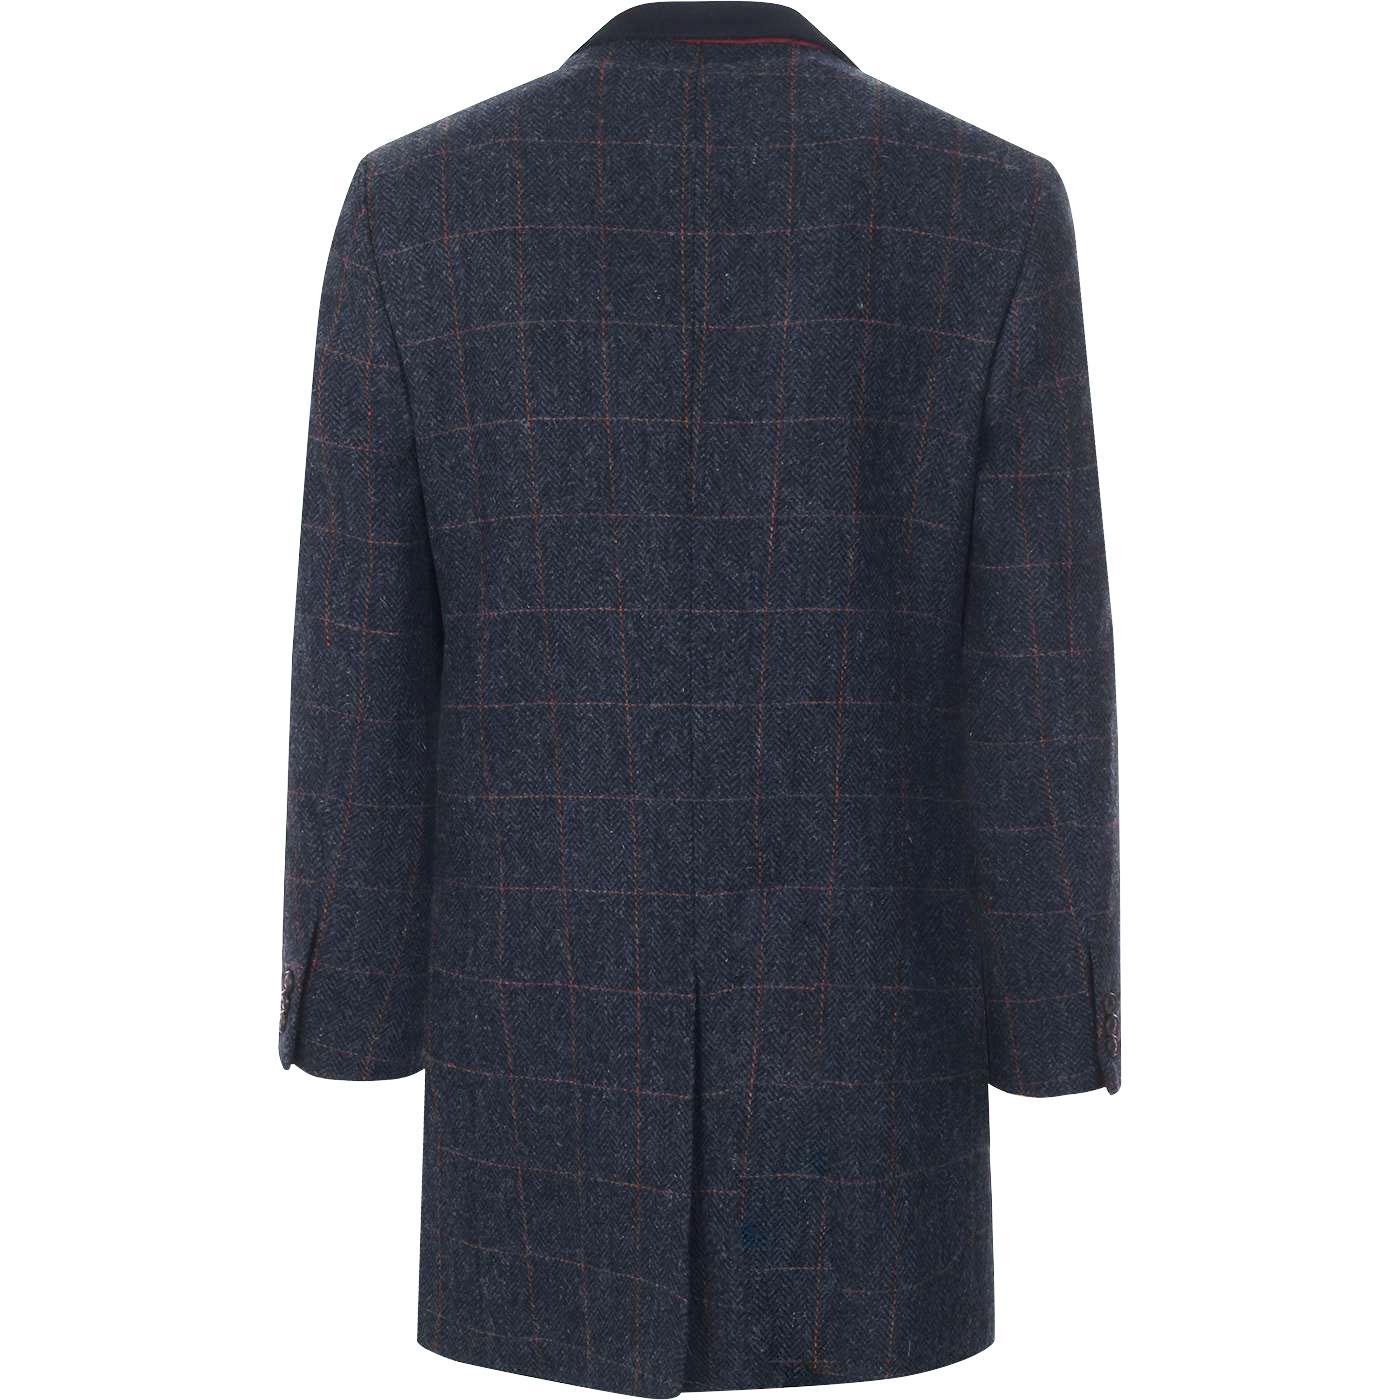 Winnie GIBSON LONDON Mod Shetland Check Dress Coat